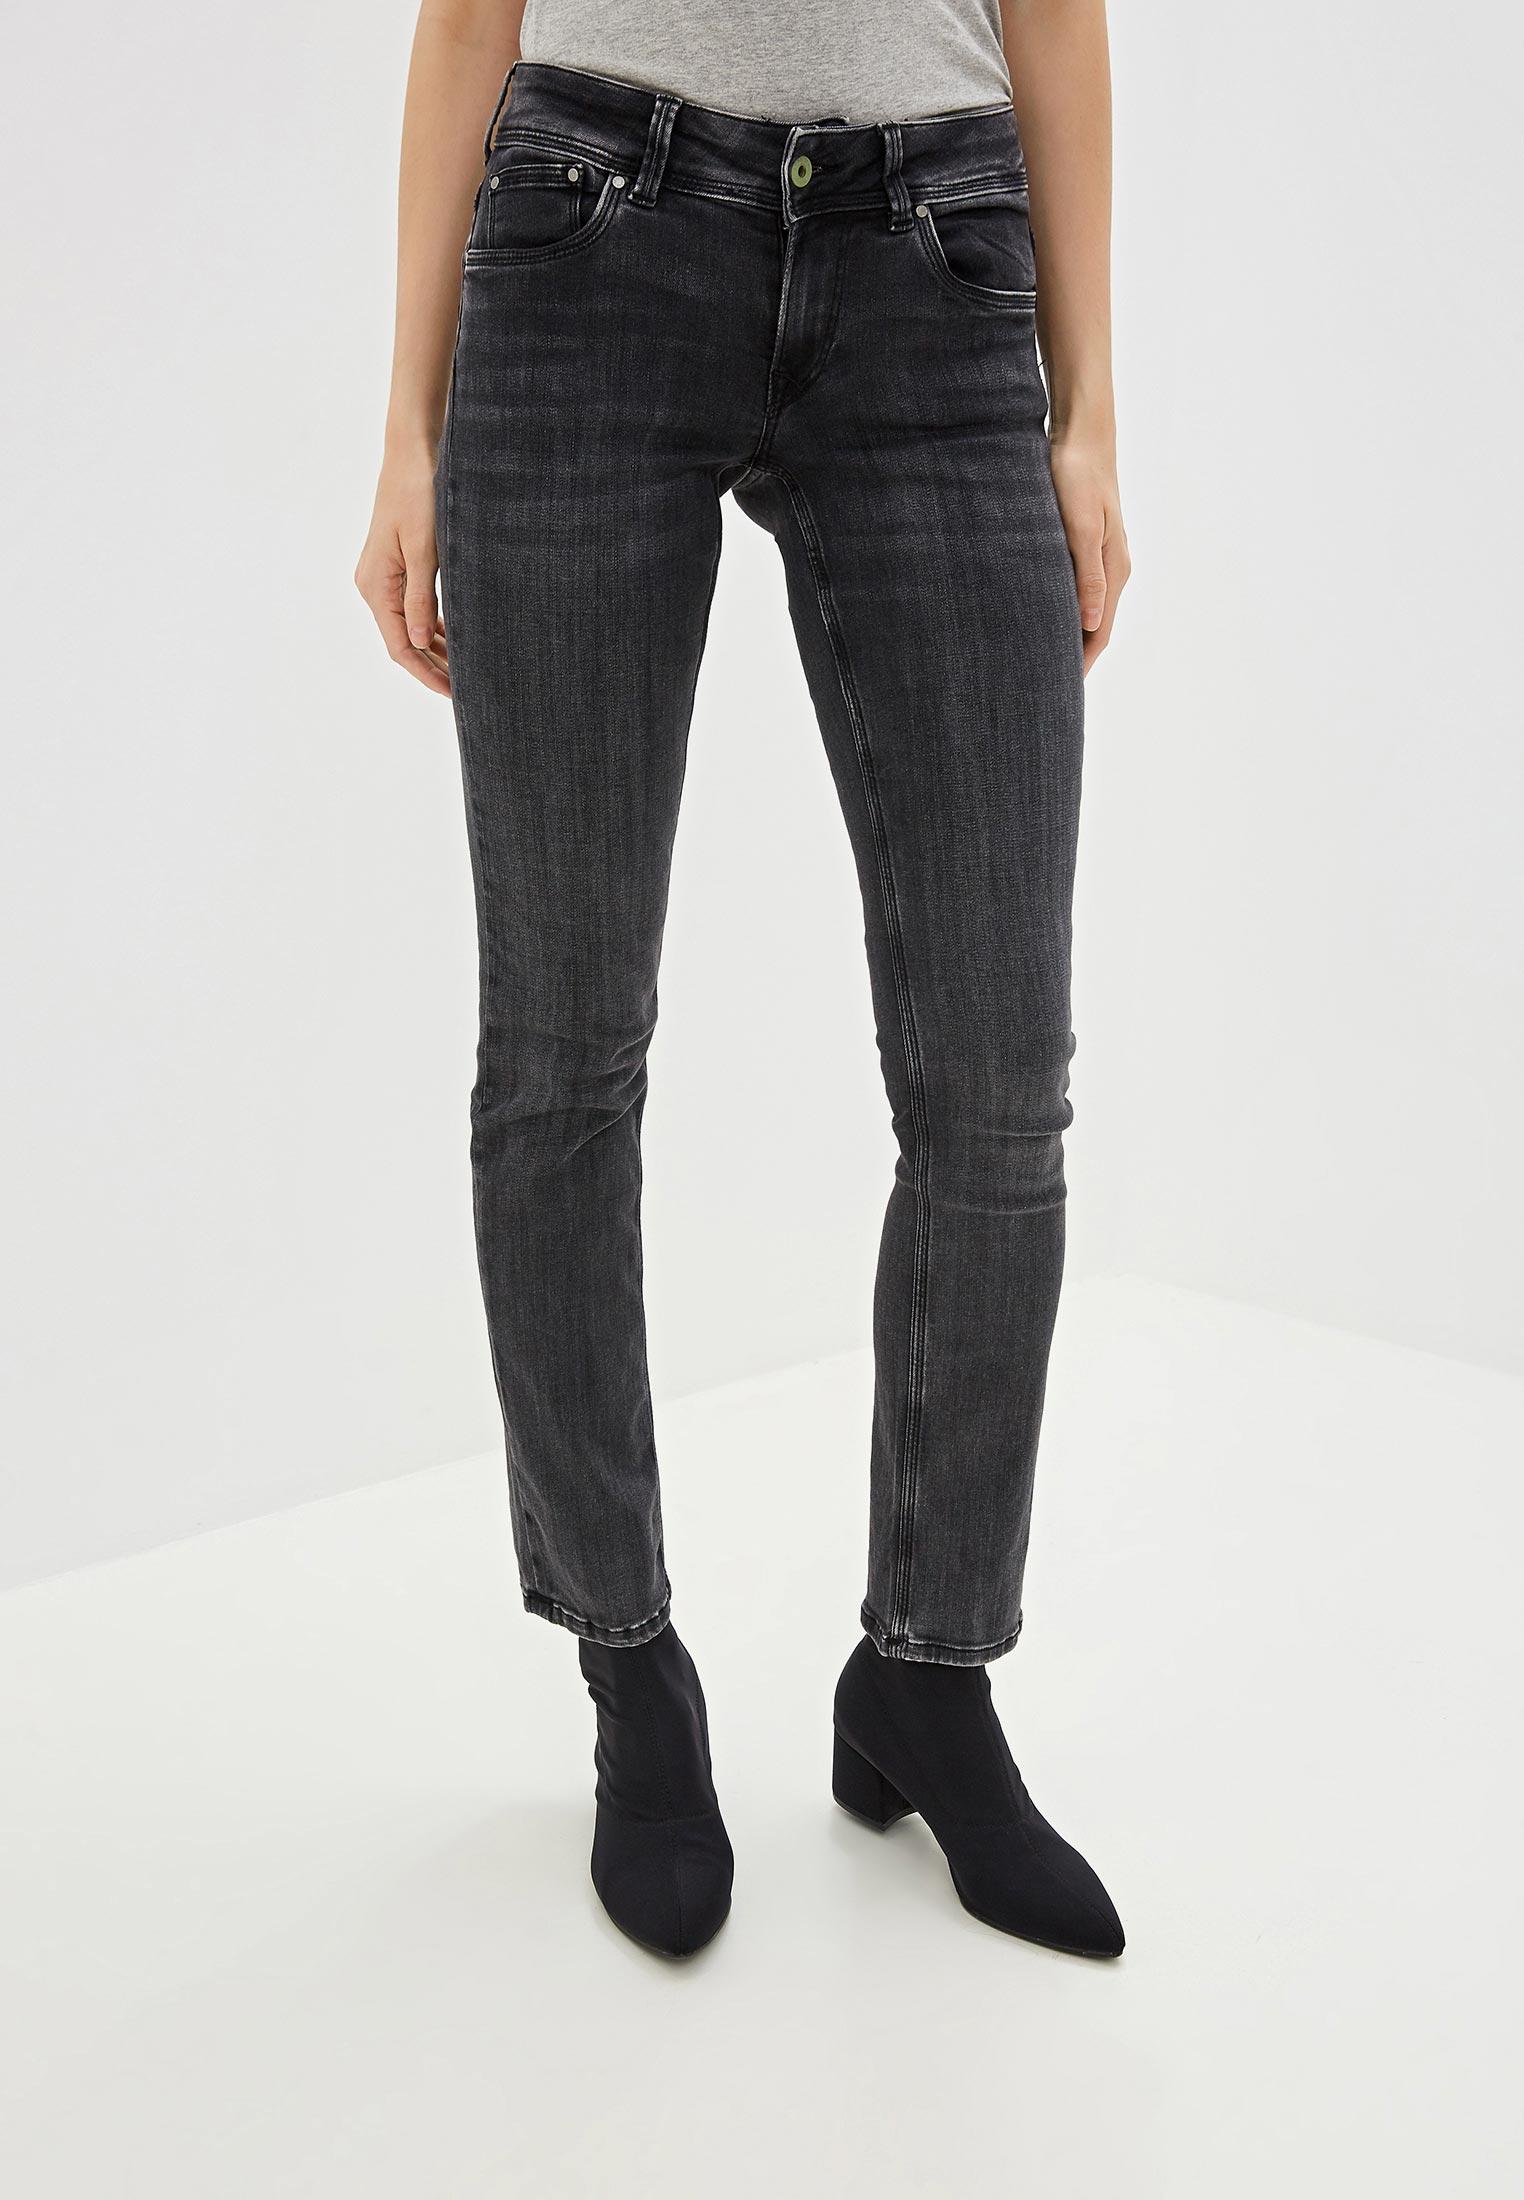 Зауженные джинсы Pepe Jeans (Пепе Джинс) PL201660WV9